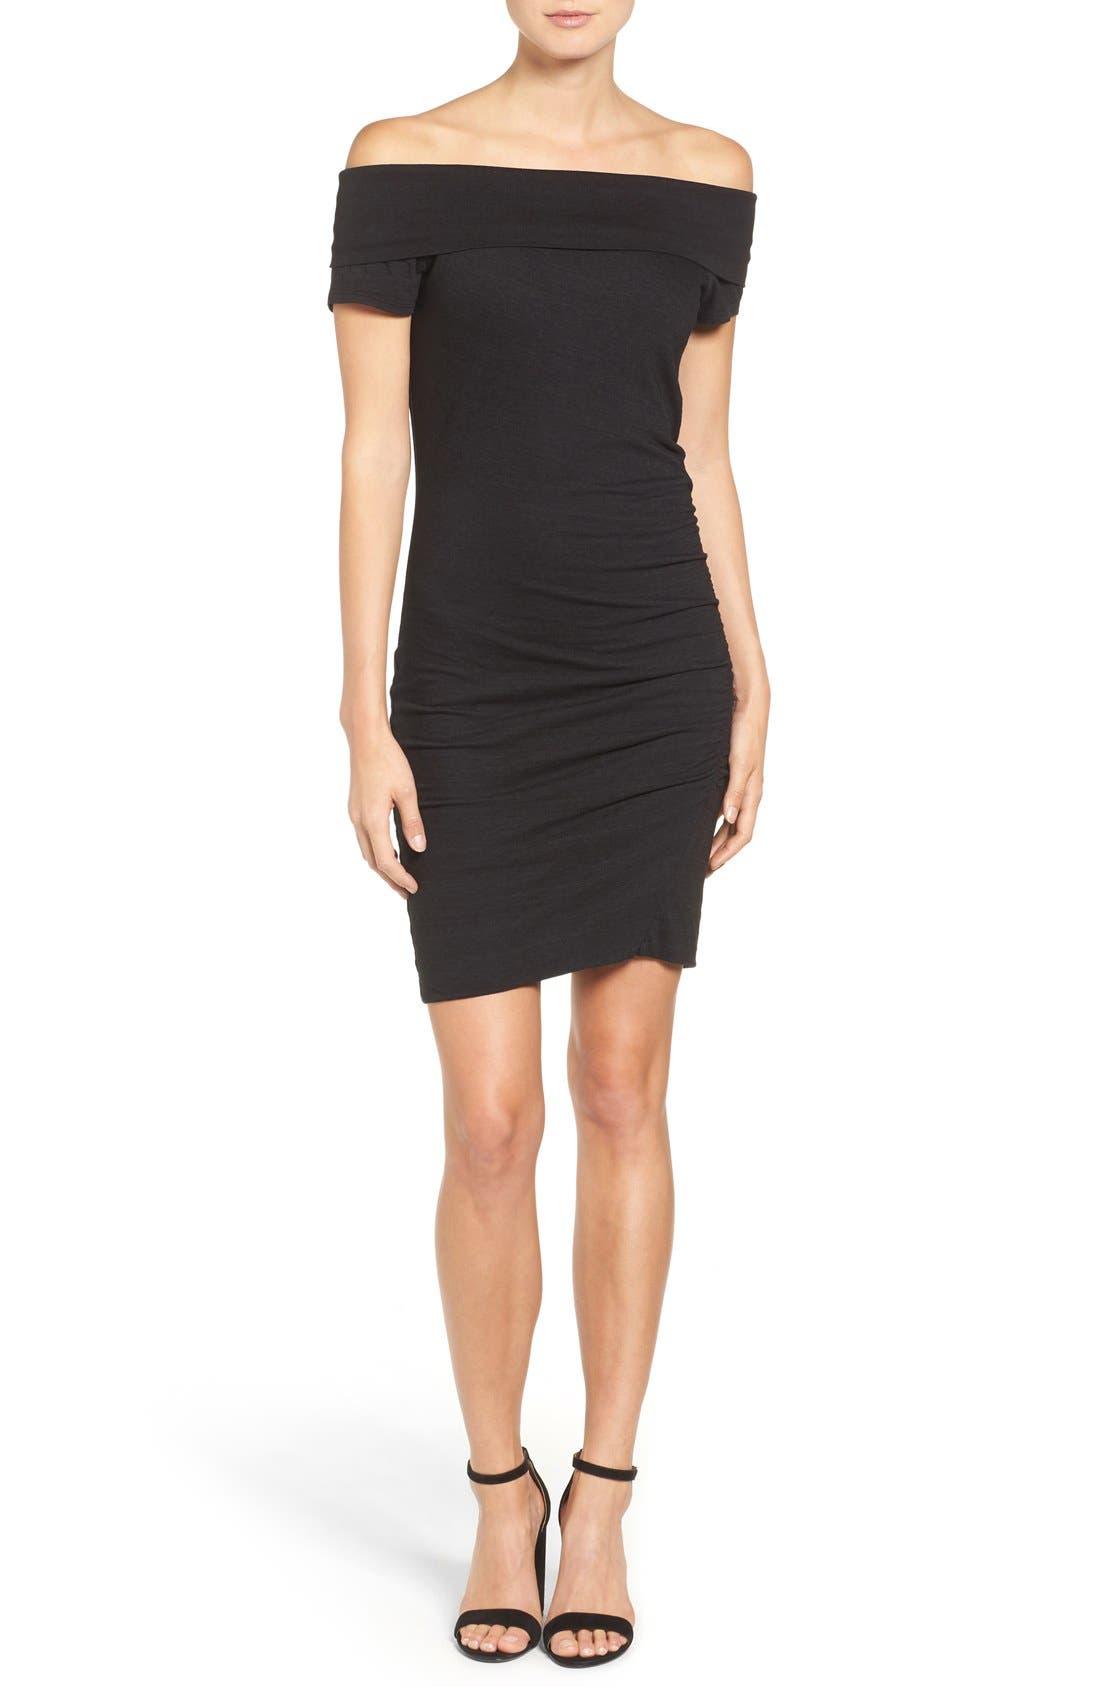 Alternate Image 1 Selected - Pam & Gela Off the Shoulder Body-Con Dress